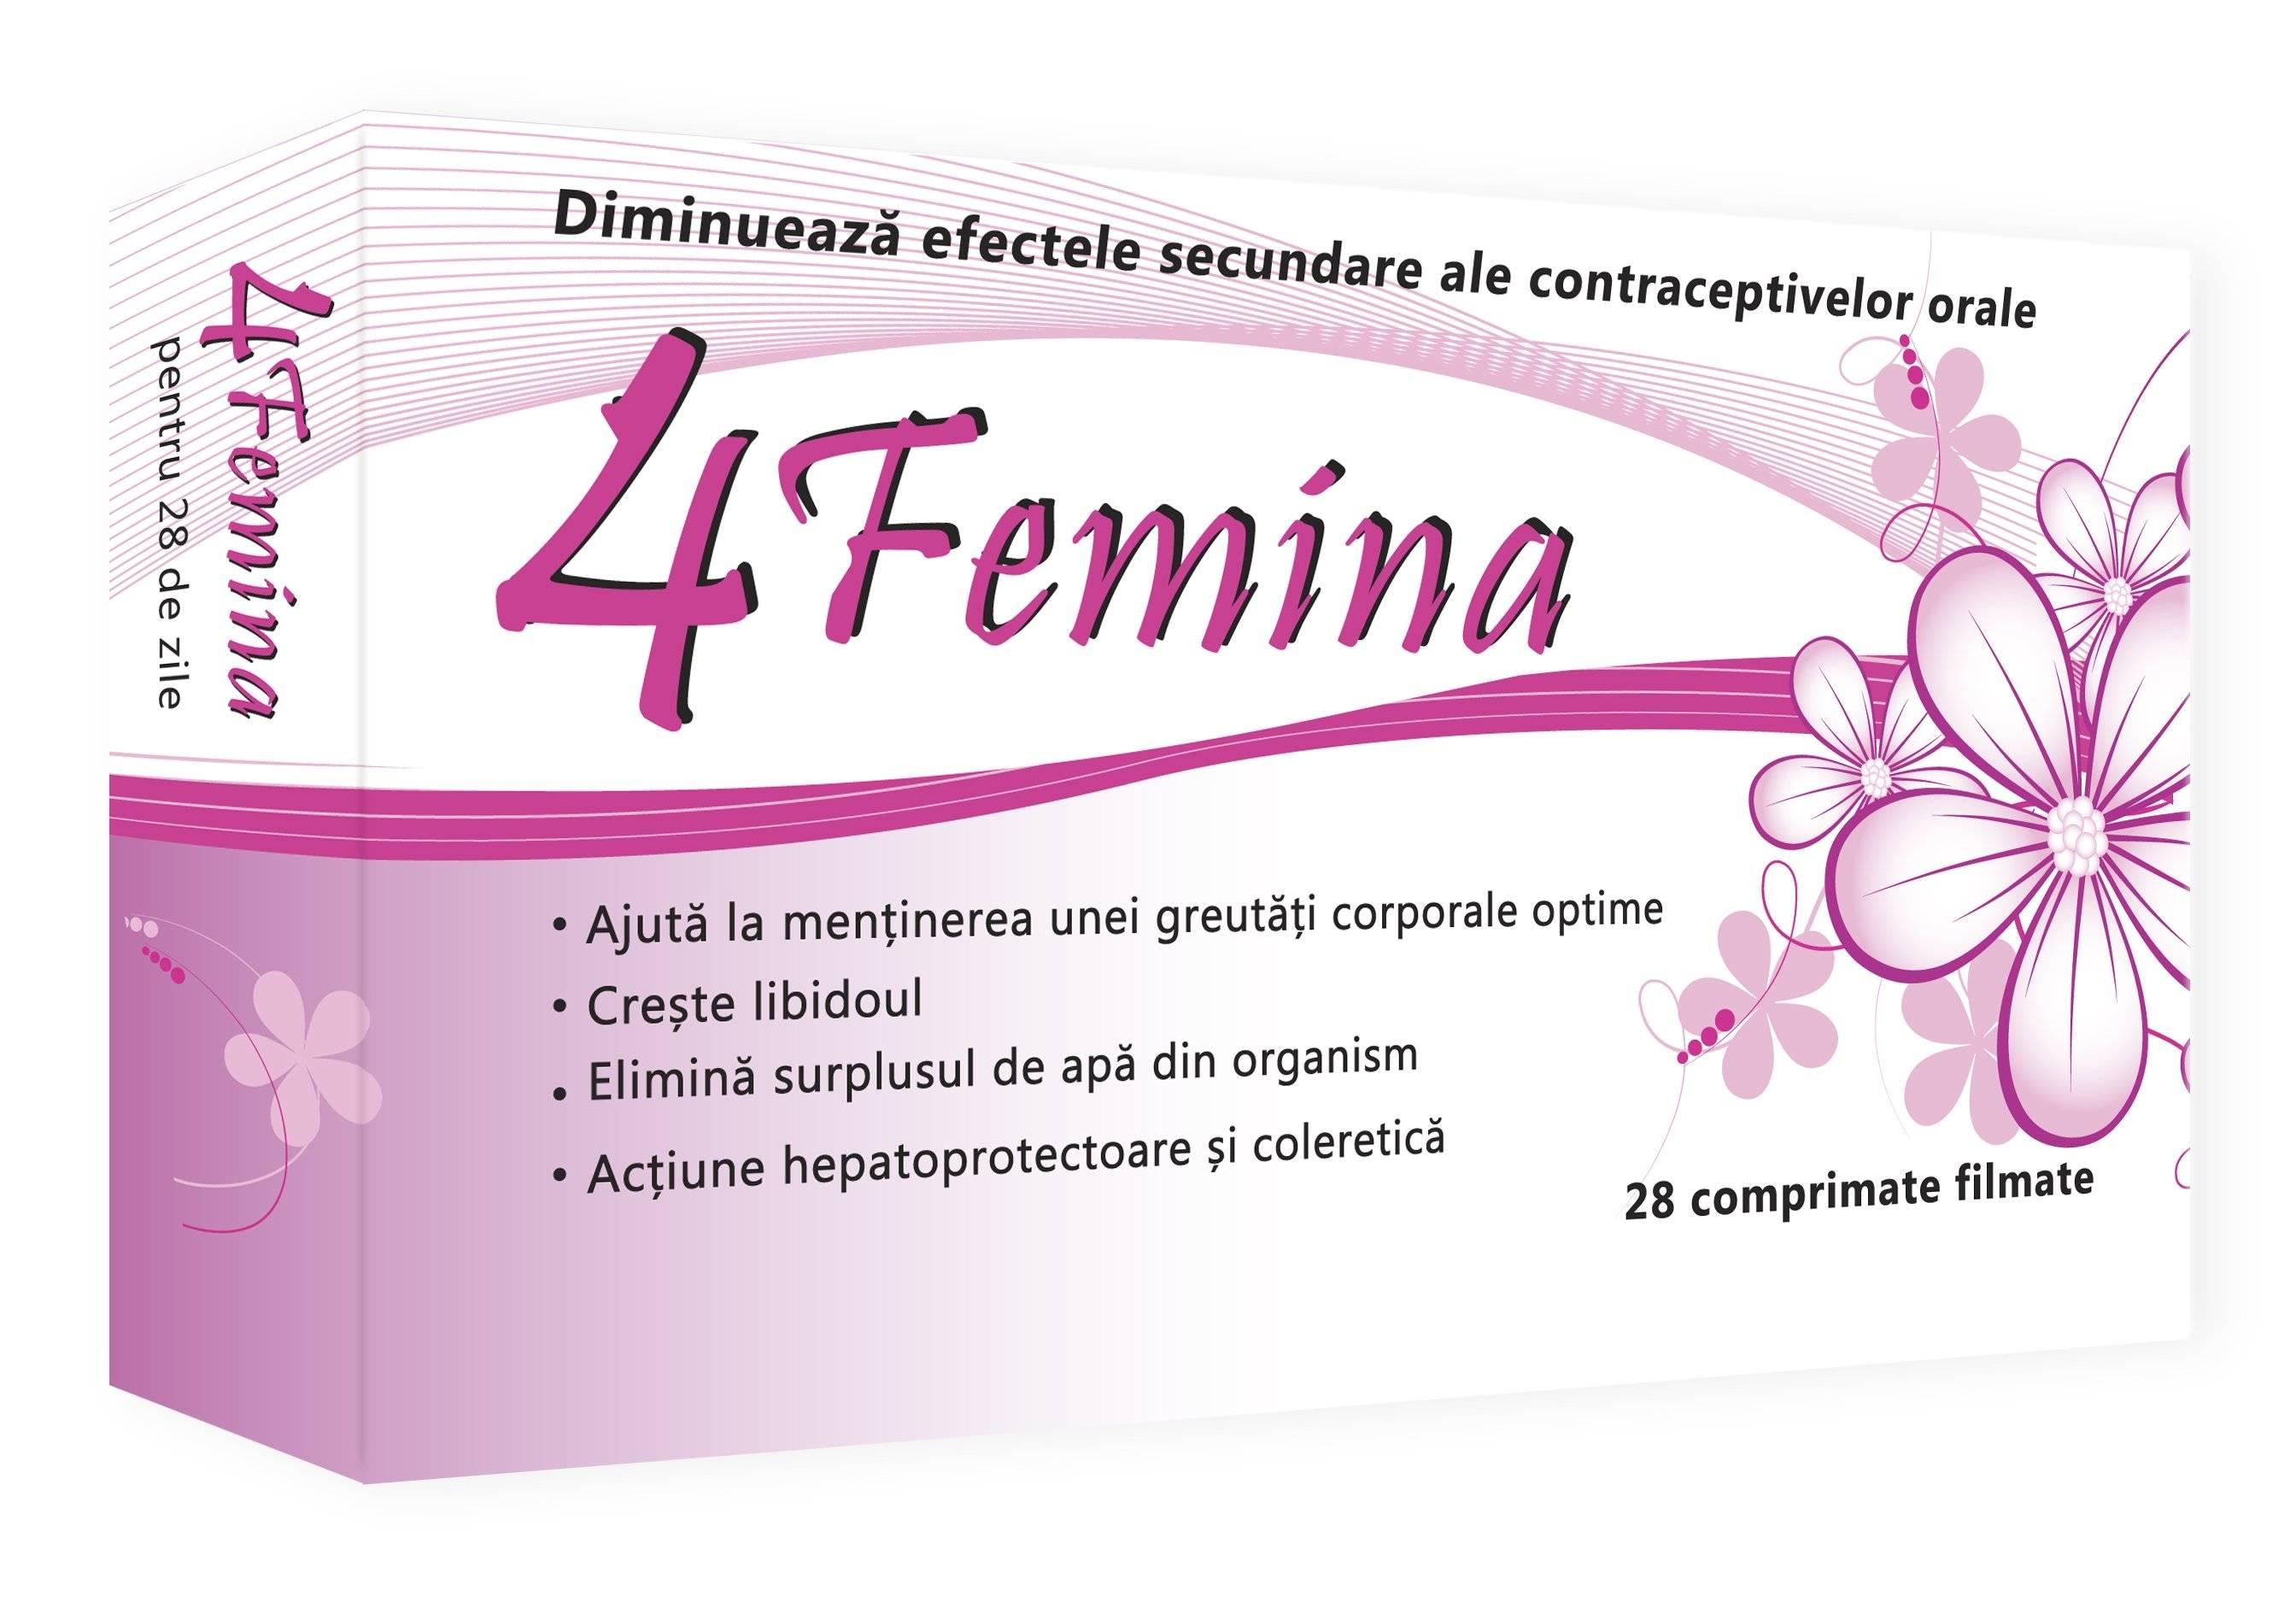 anticonceptionale care te ajuta sa slabesti)